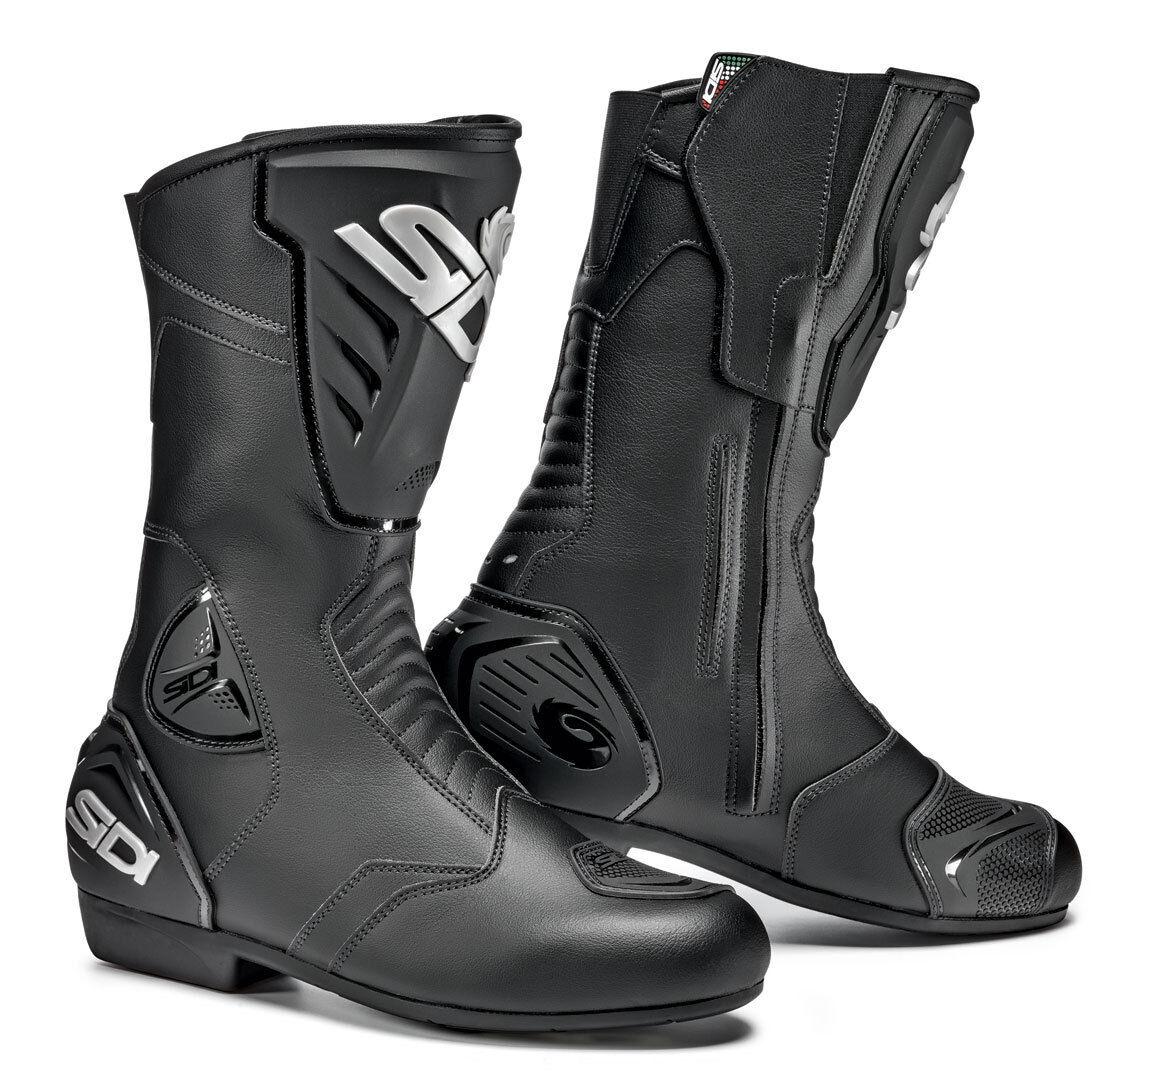 Sidi Black Rain Motos botas impermeable Negro 46